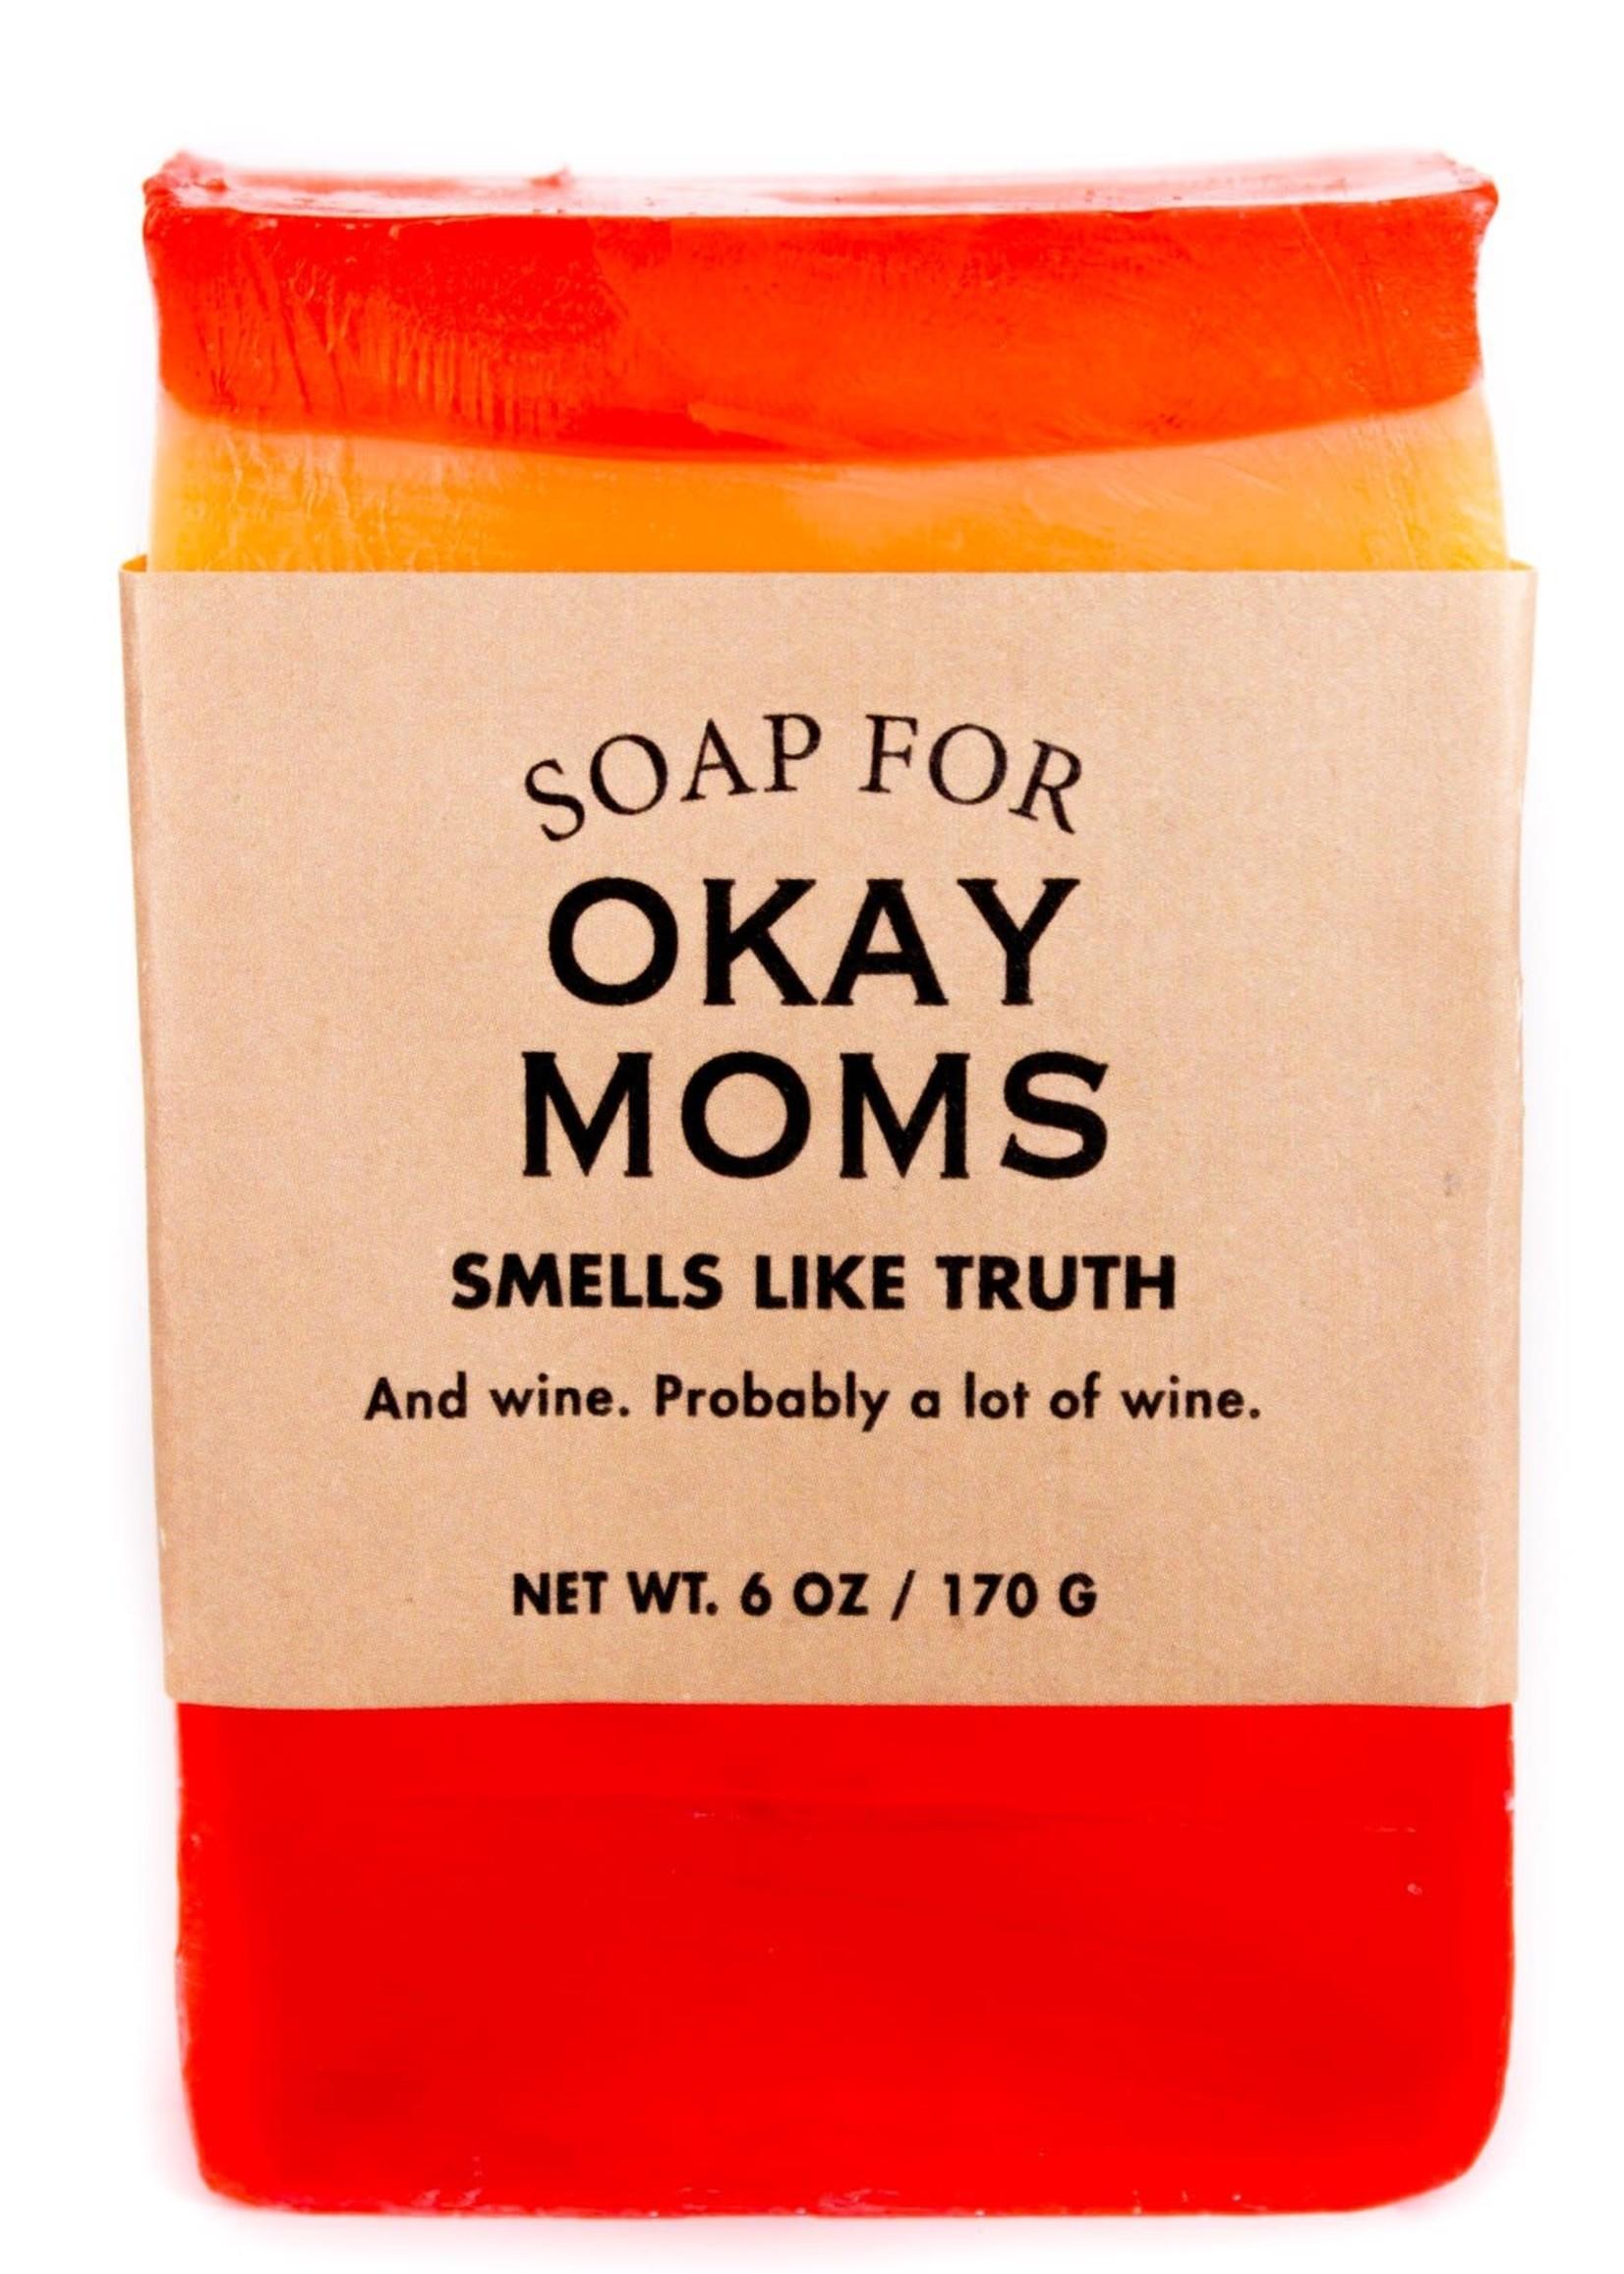 Whiskey River Soap Co. Whiskey River Soap Co. Soap Okay Moms